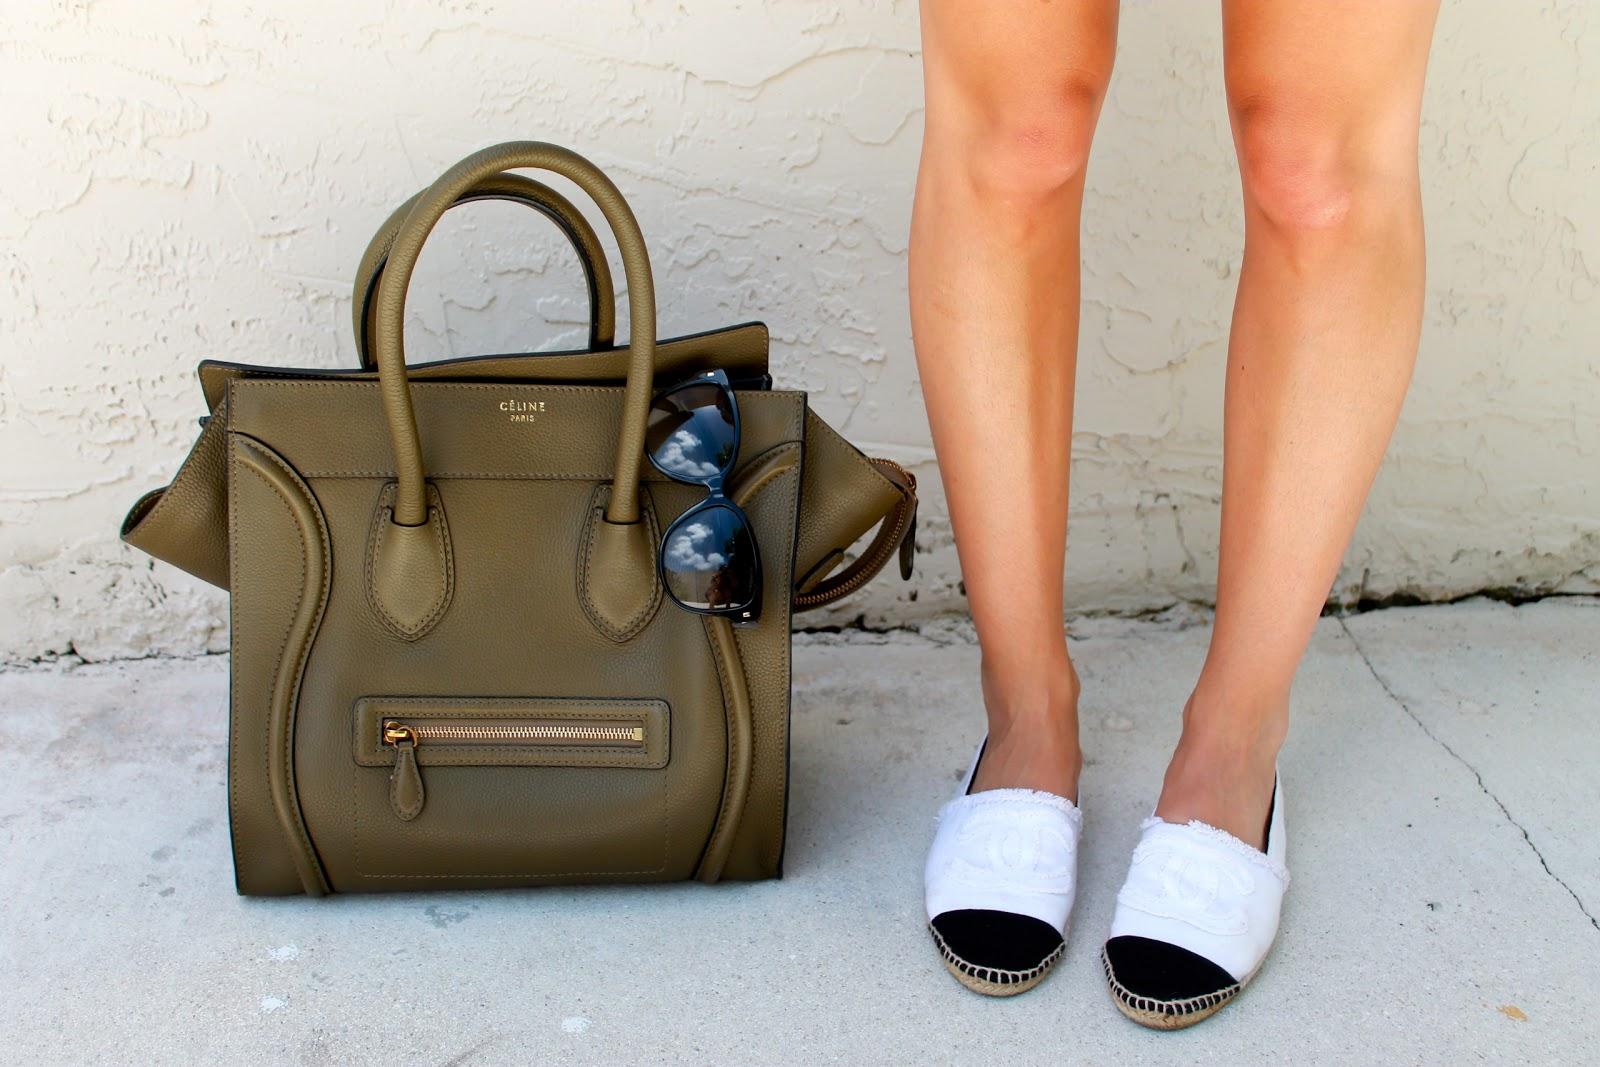 celine yellow handbag - Carolosiphy: June 2013